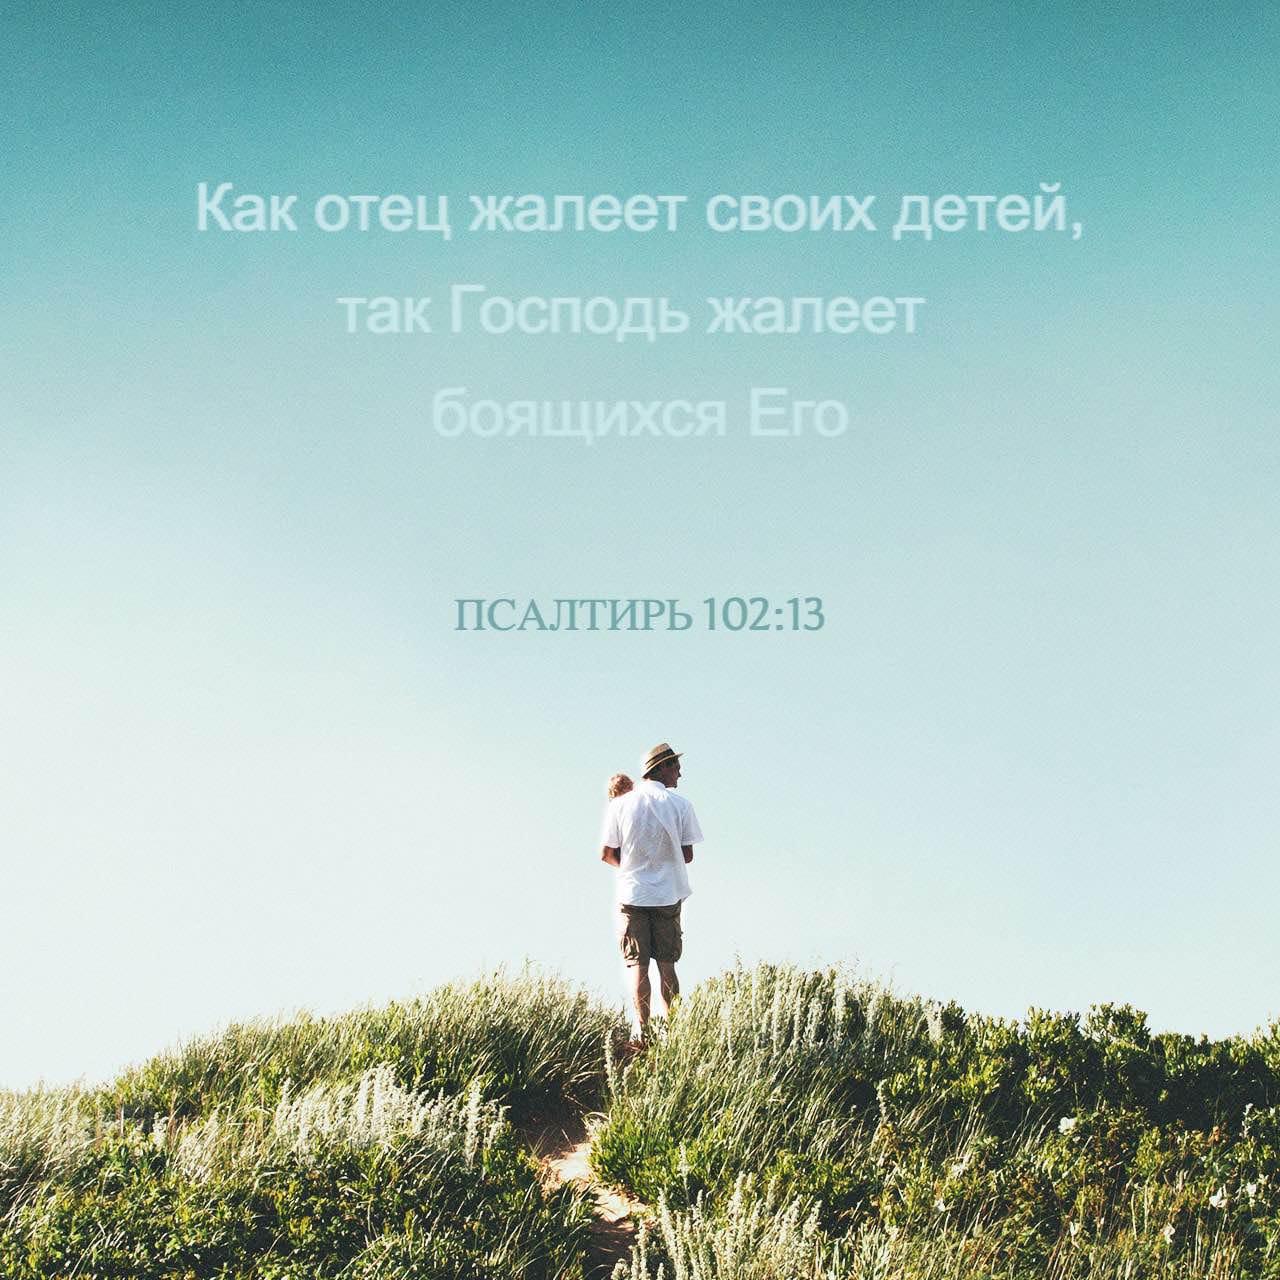 Фото-стих из Псалма 102:13